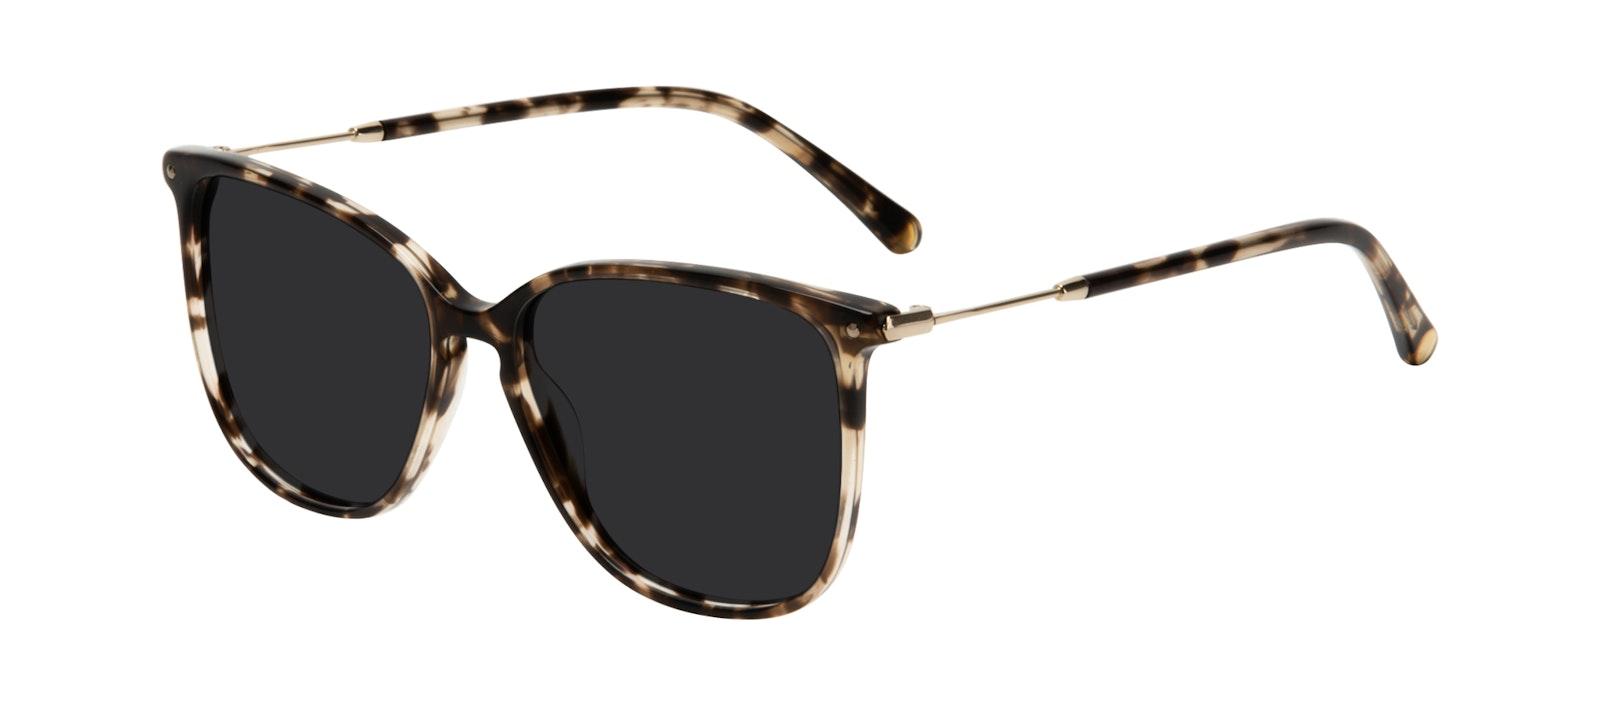 Affordable Fashion Glasses Square Sunglasses Women Sonia Snake Skin Tilt